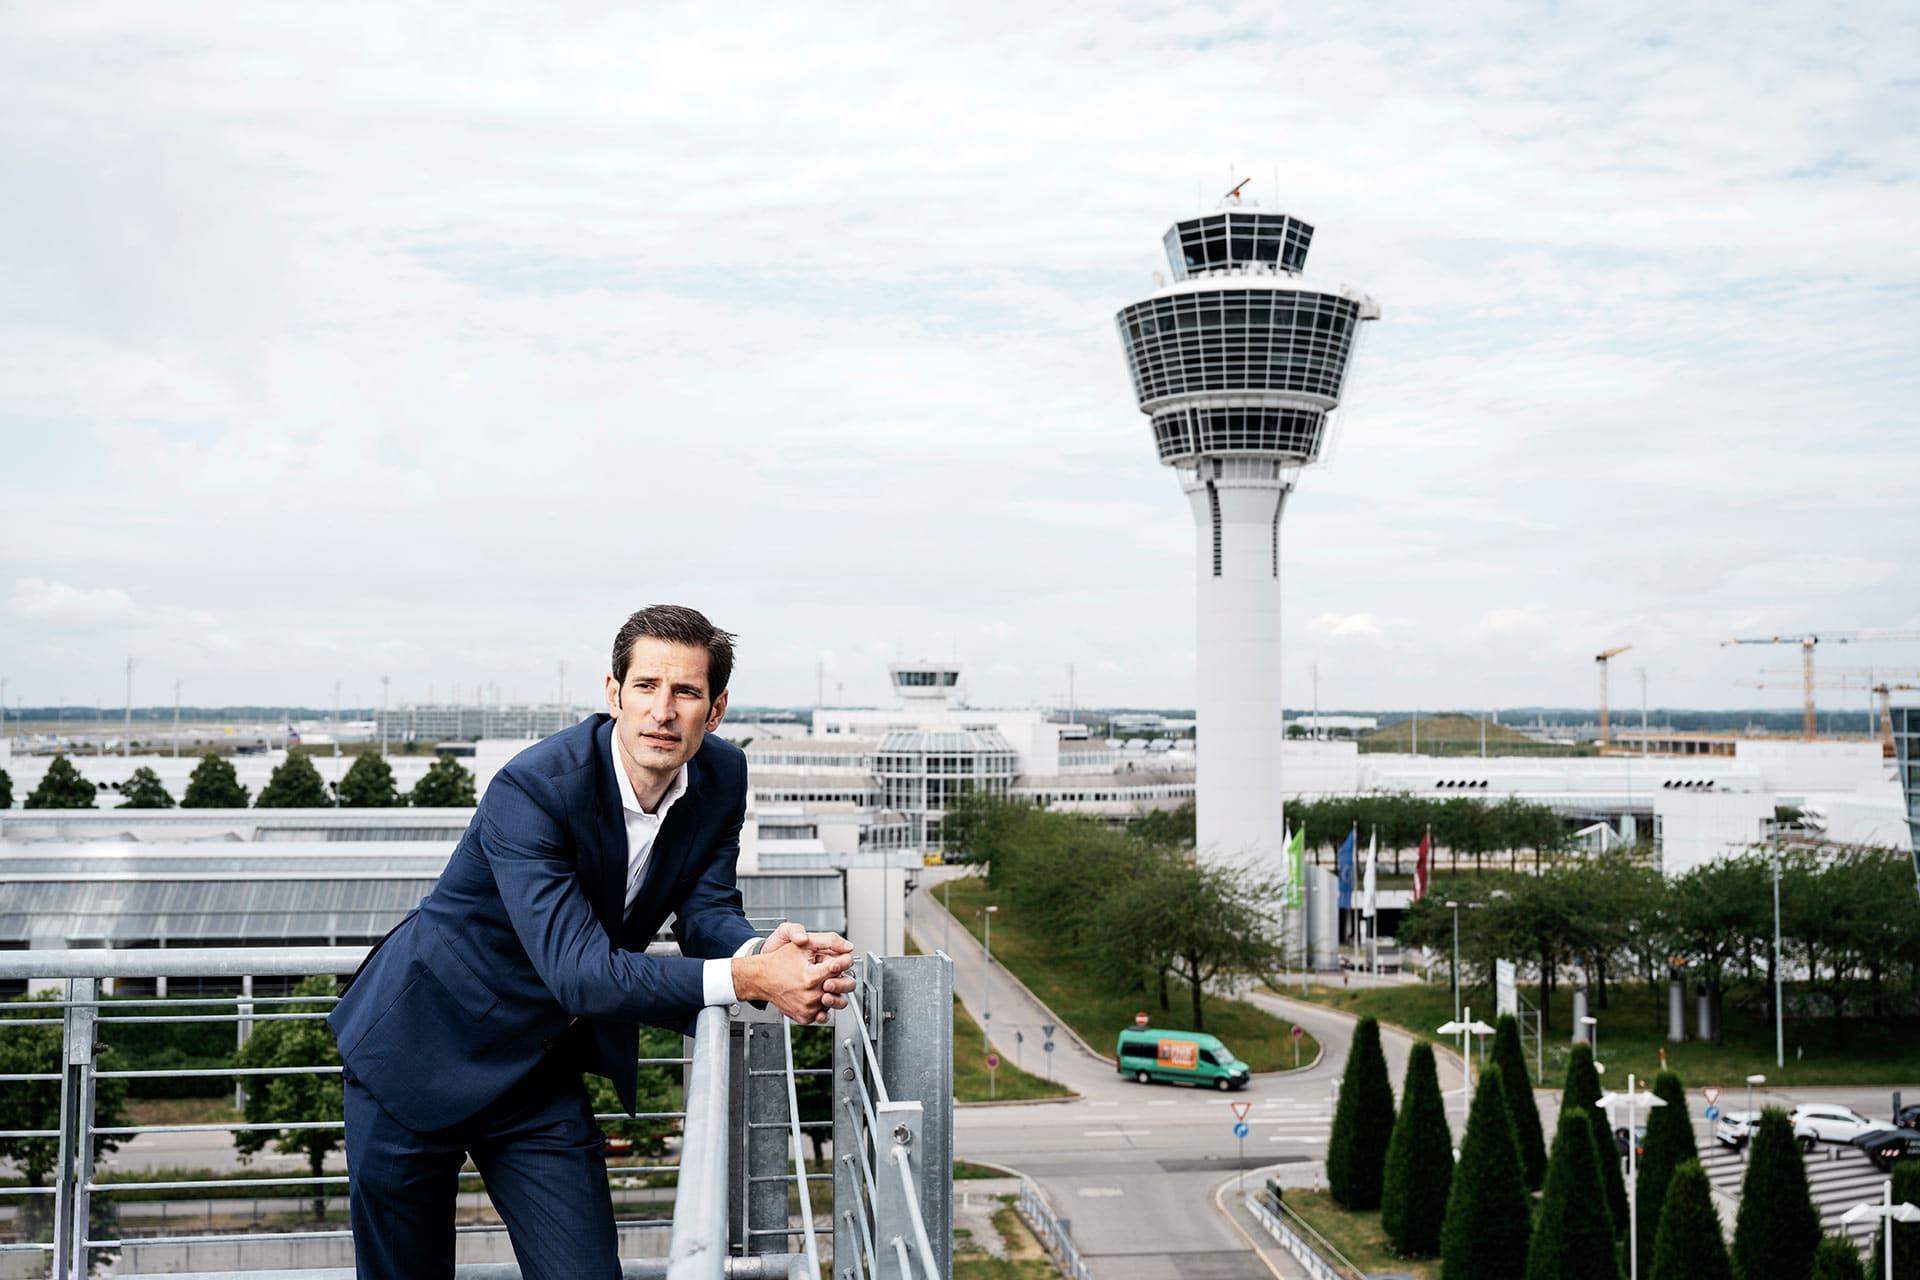 Autor Gregor Grandl am Münchener Flughafen